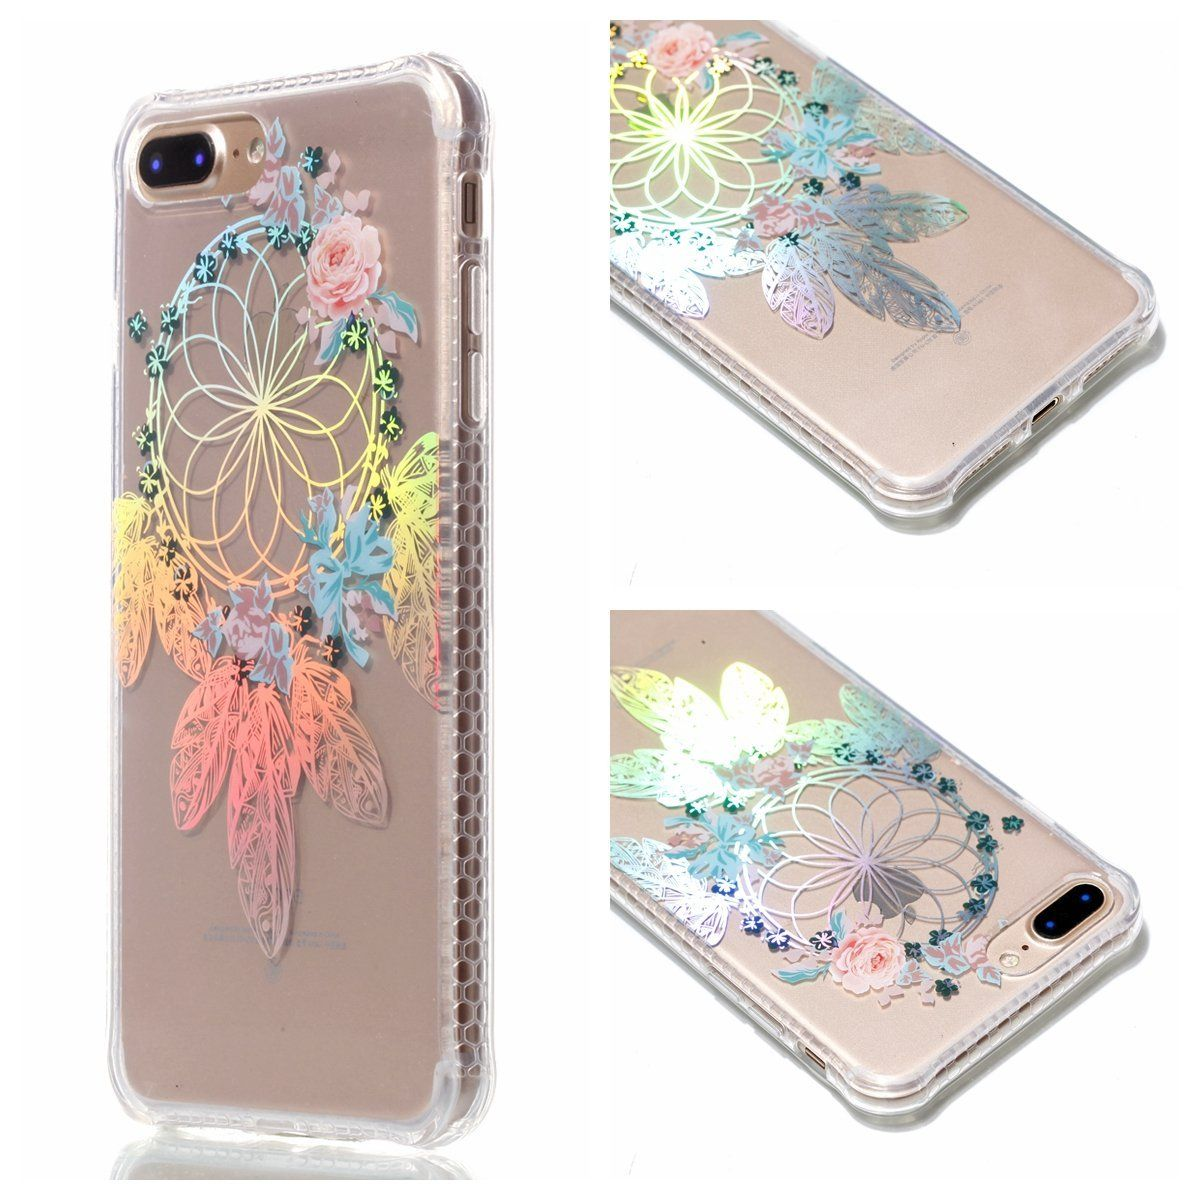 Coloring pages mandala · aiiyg ds iphone 7 plus iphone 8 plus case electroplating mandala floral pattern case